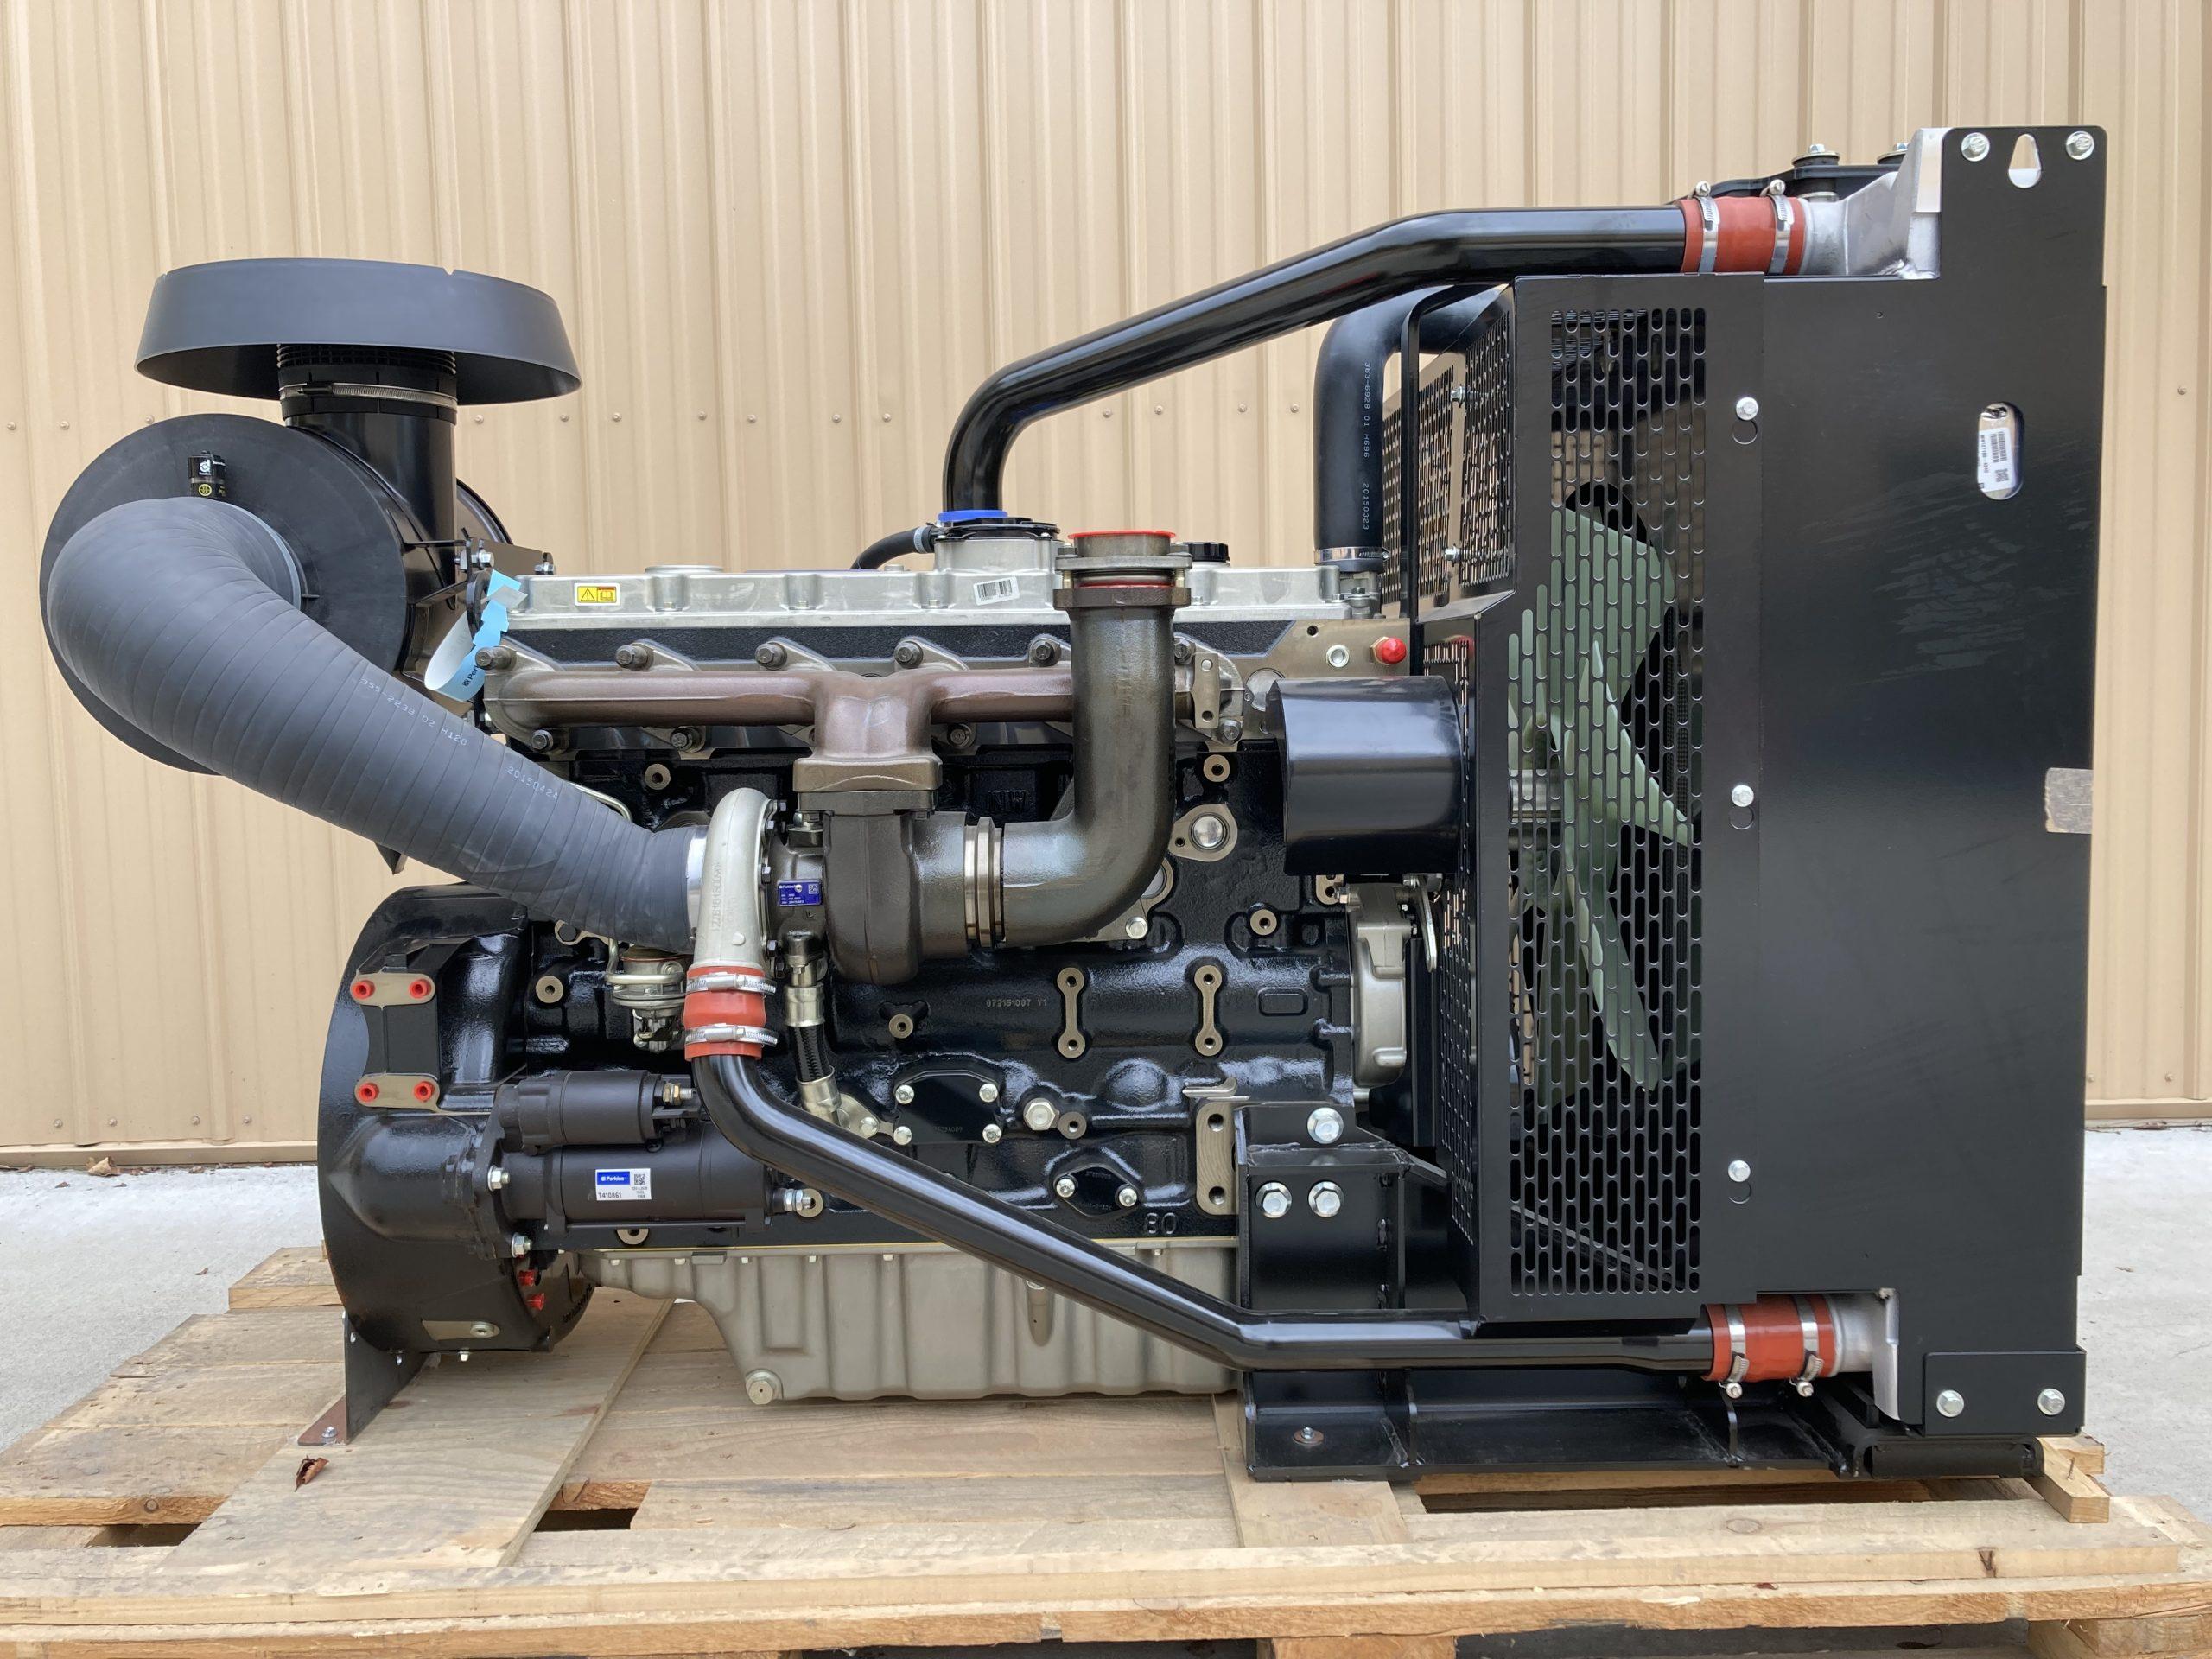 2015 Perkins 1106A-70TA Complete Turbo Diesel Power Unit